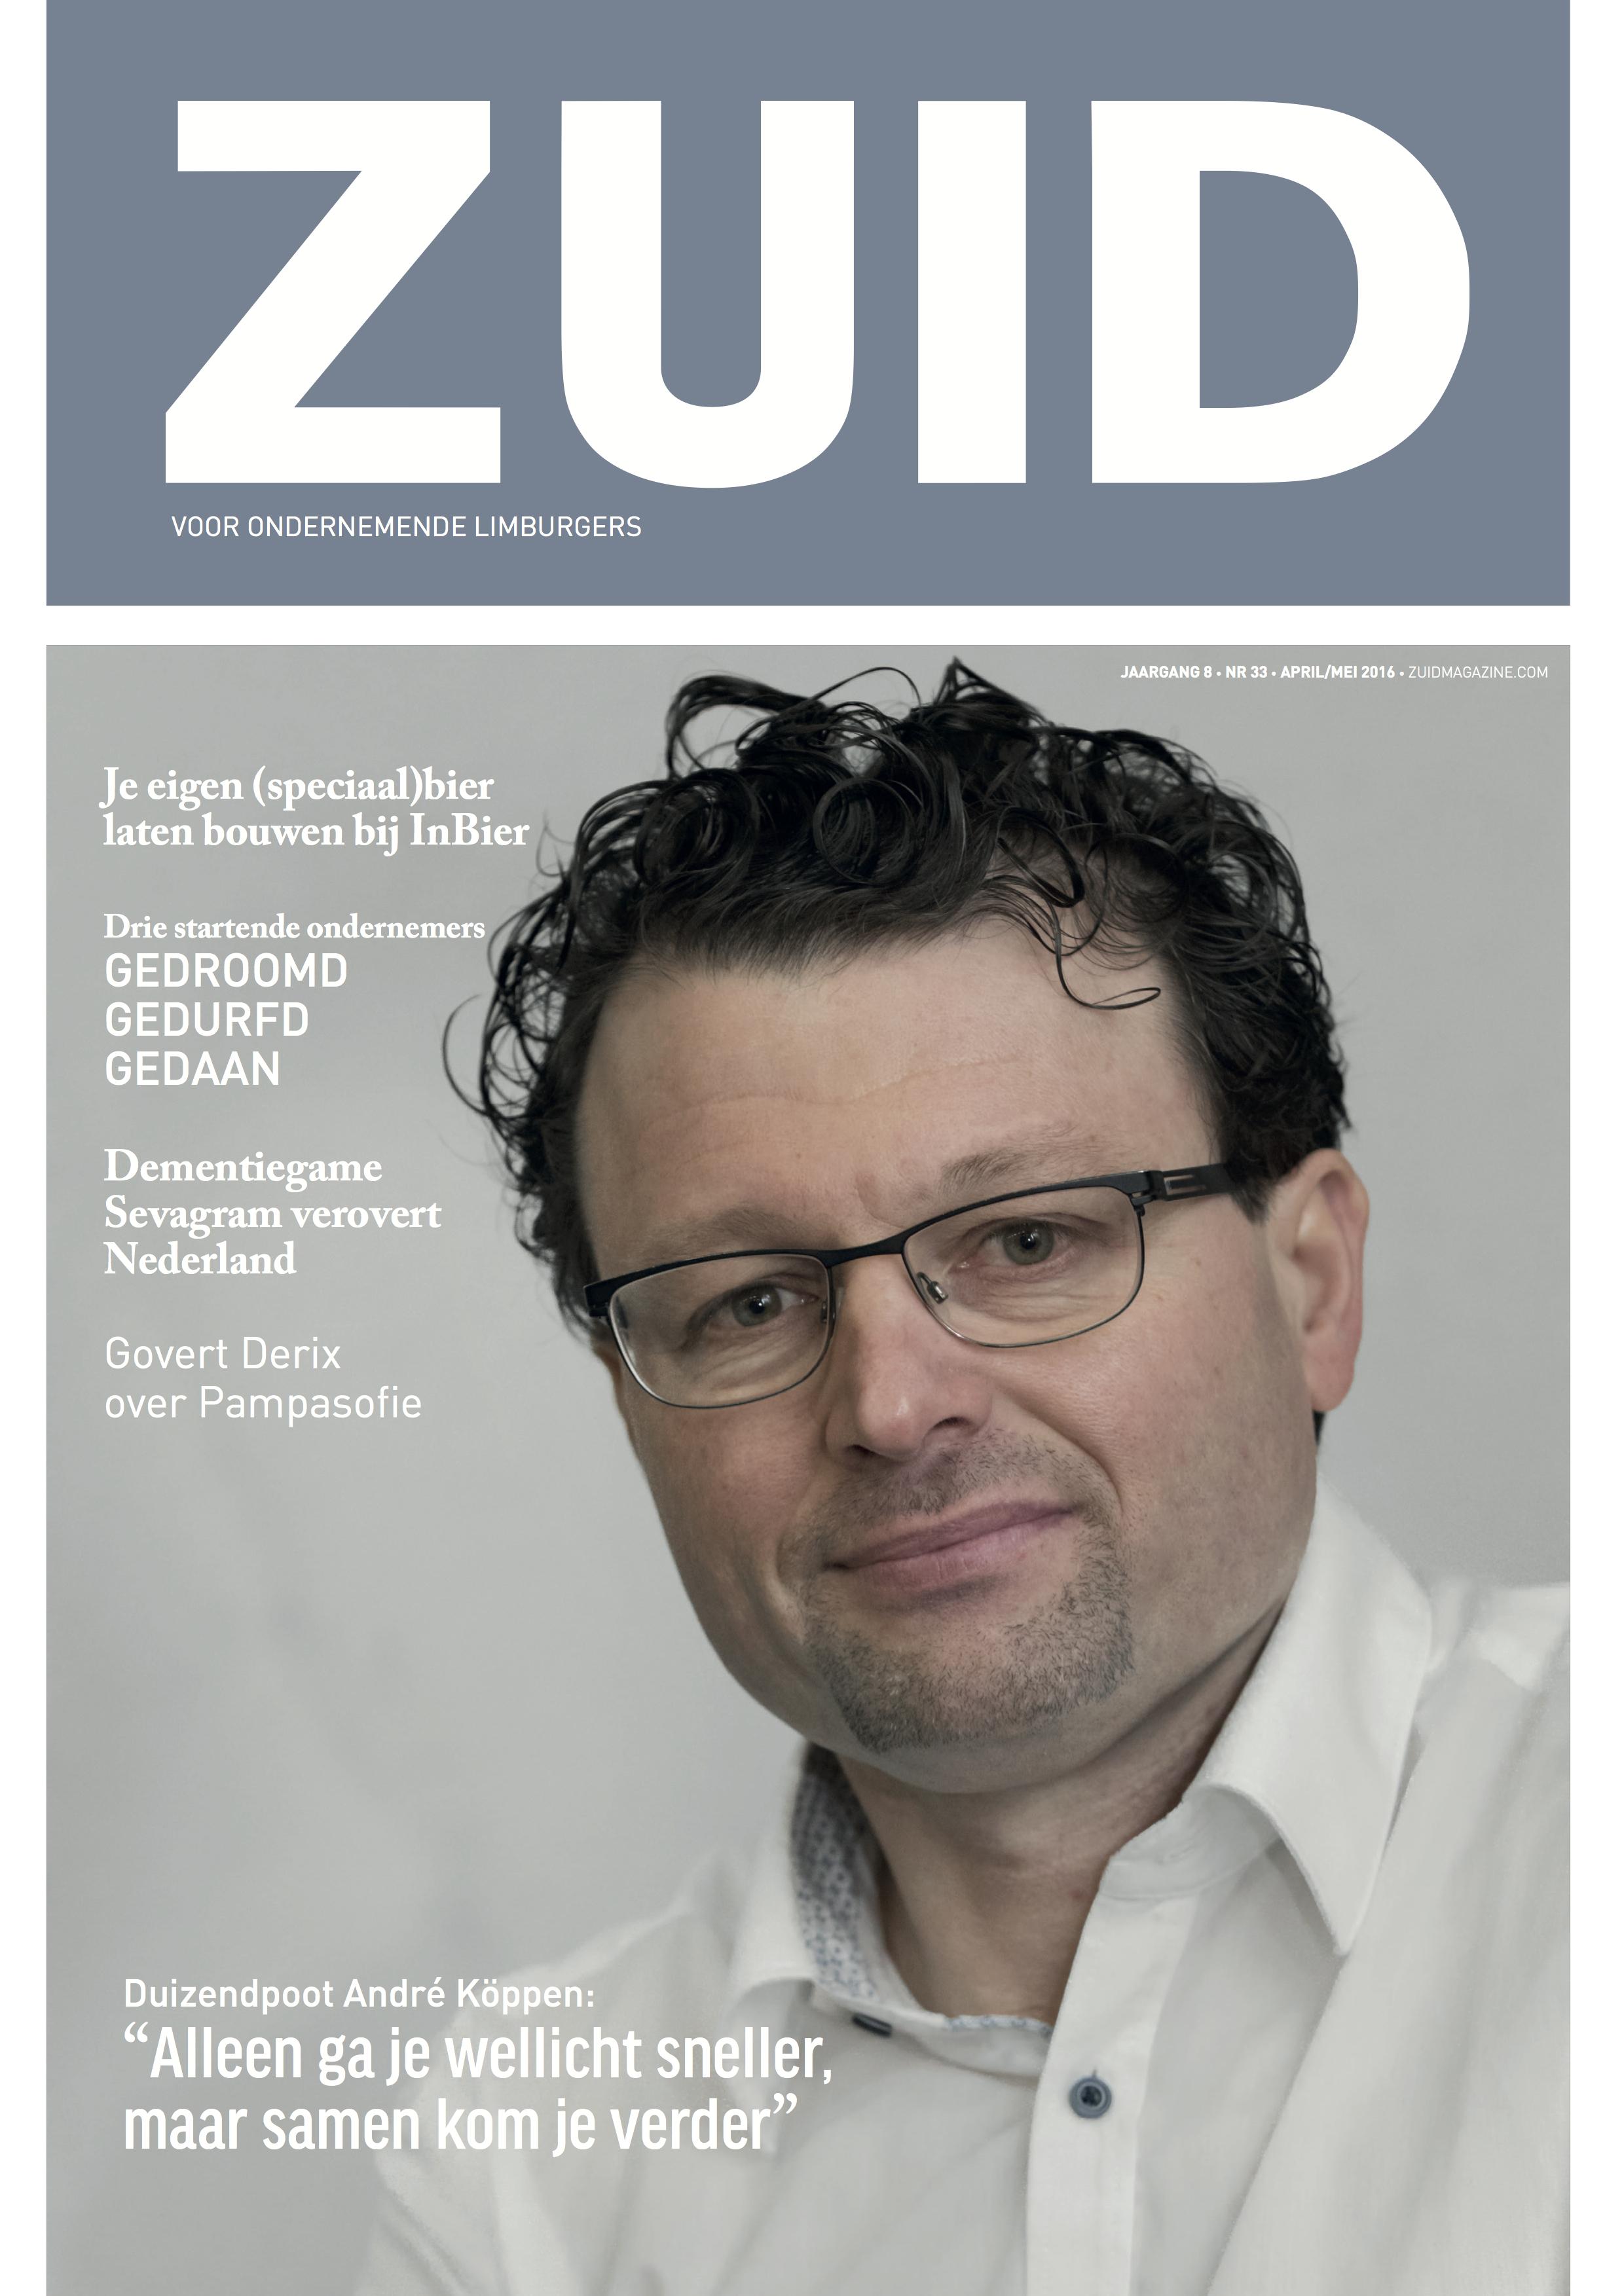 ZUID_MAGAZINE_NR2_APRIL_HR cover